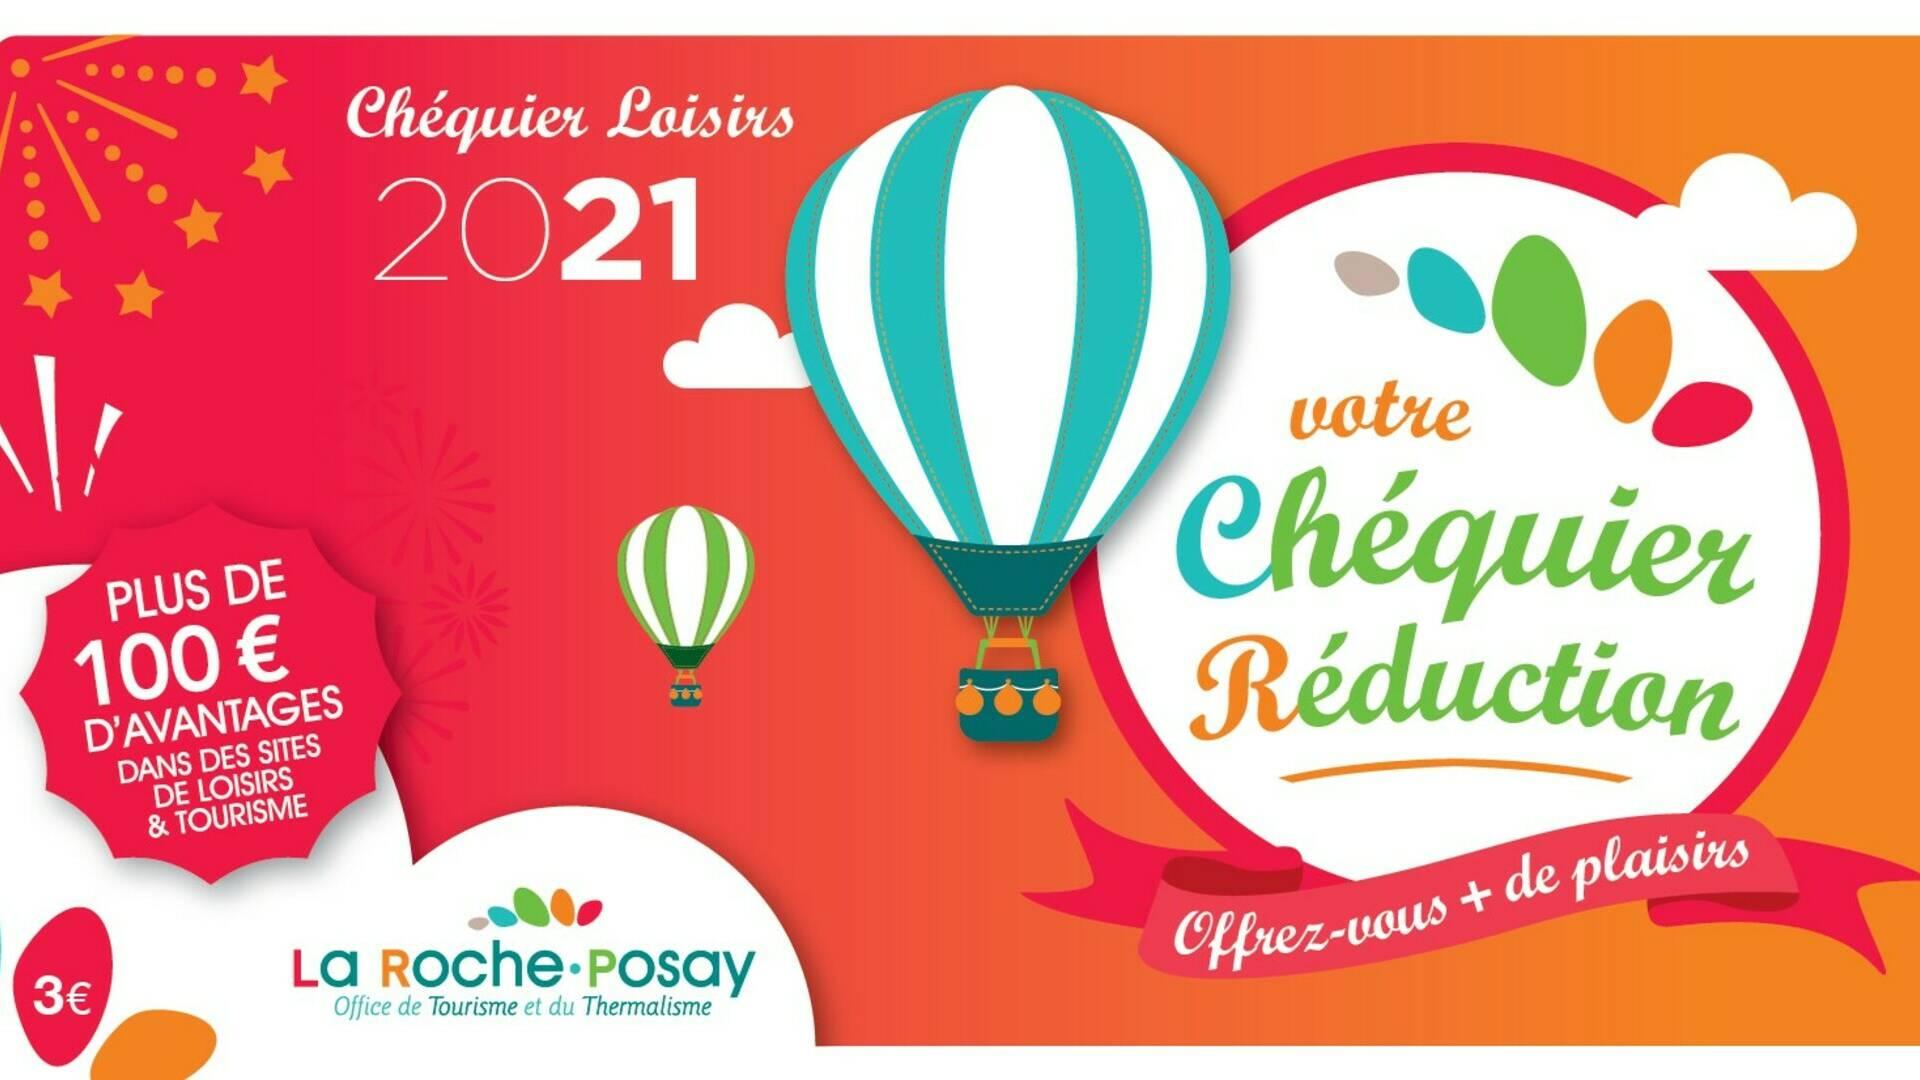 Chéquier Loisirs La Roche-Posay